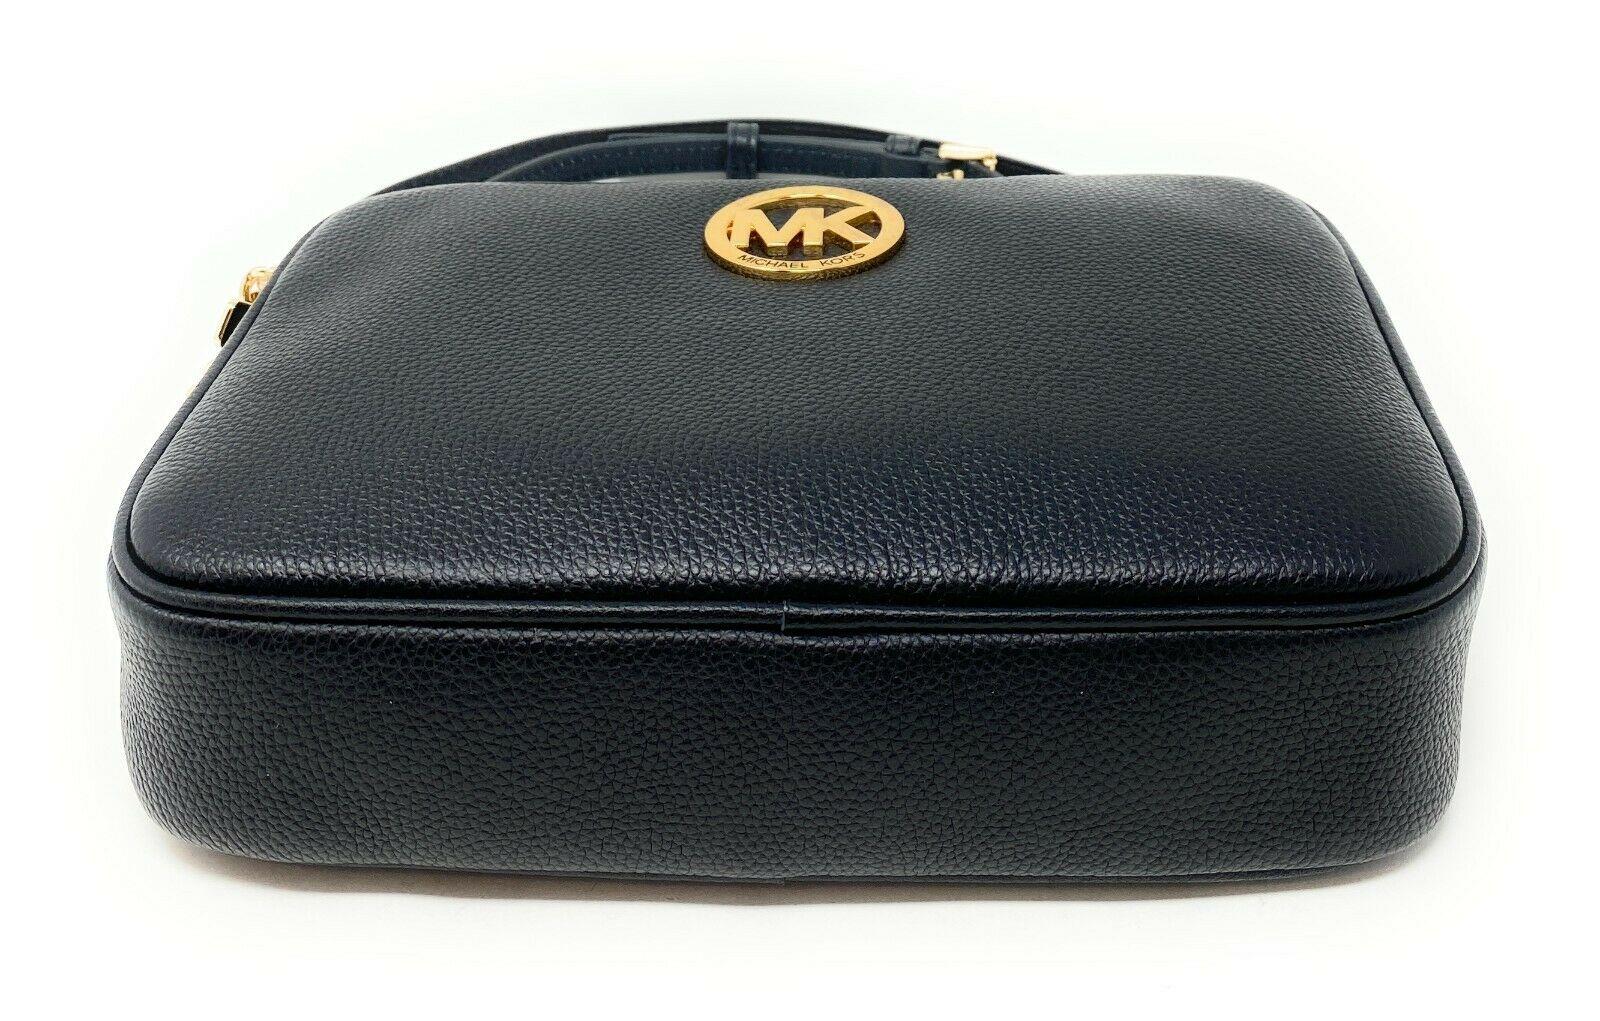 thumbnail 96 - Michael Kors Jet Set Item Large East West Crossbody Chain Handbag Clutch $298